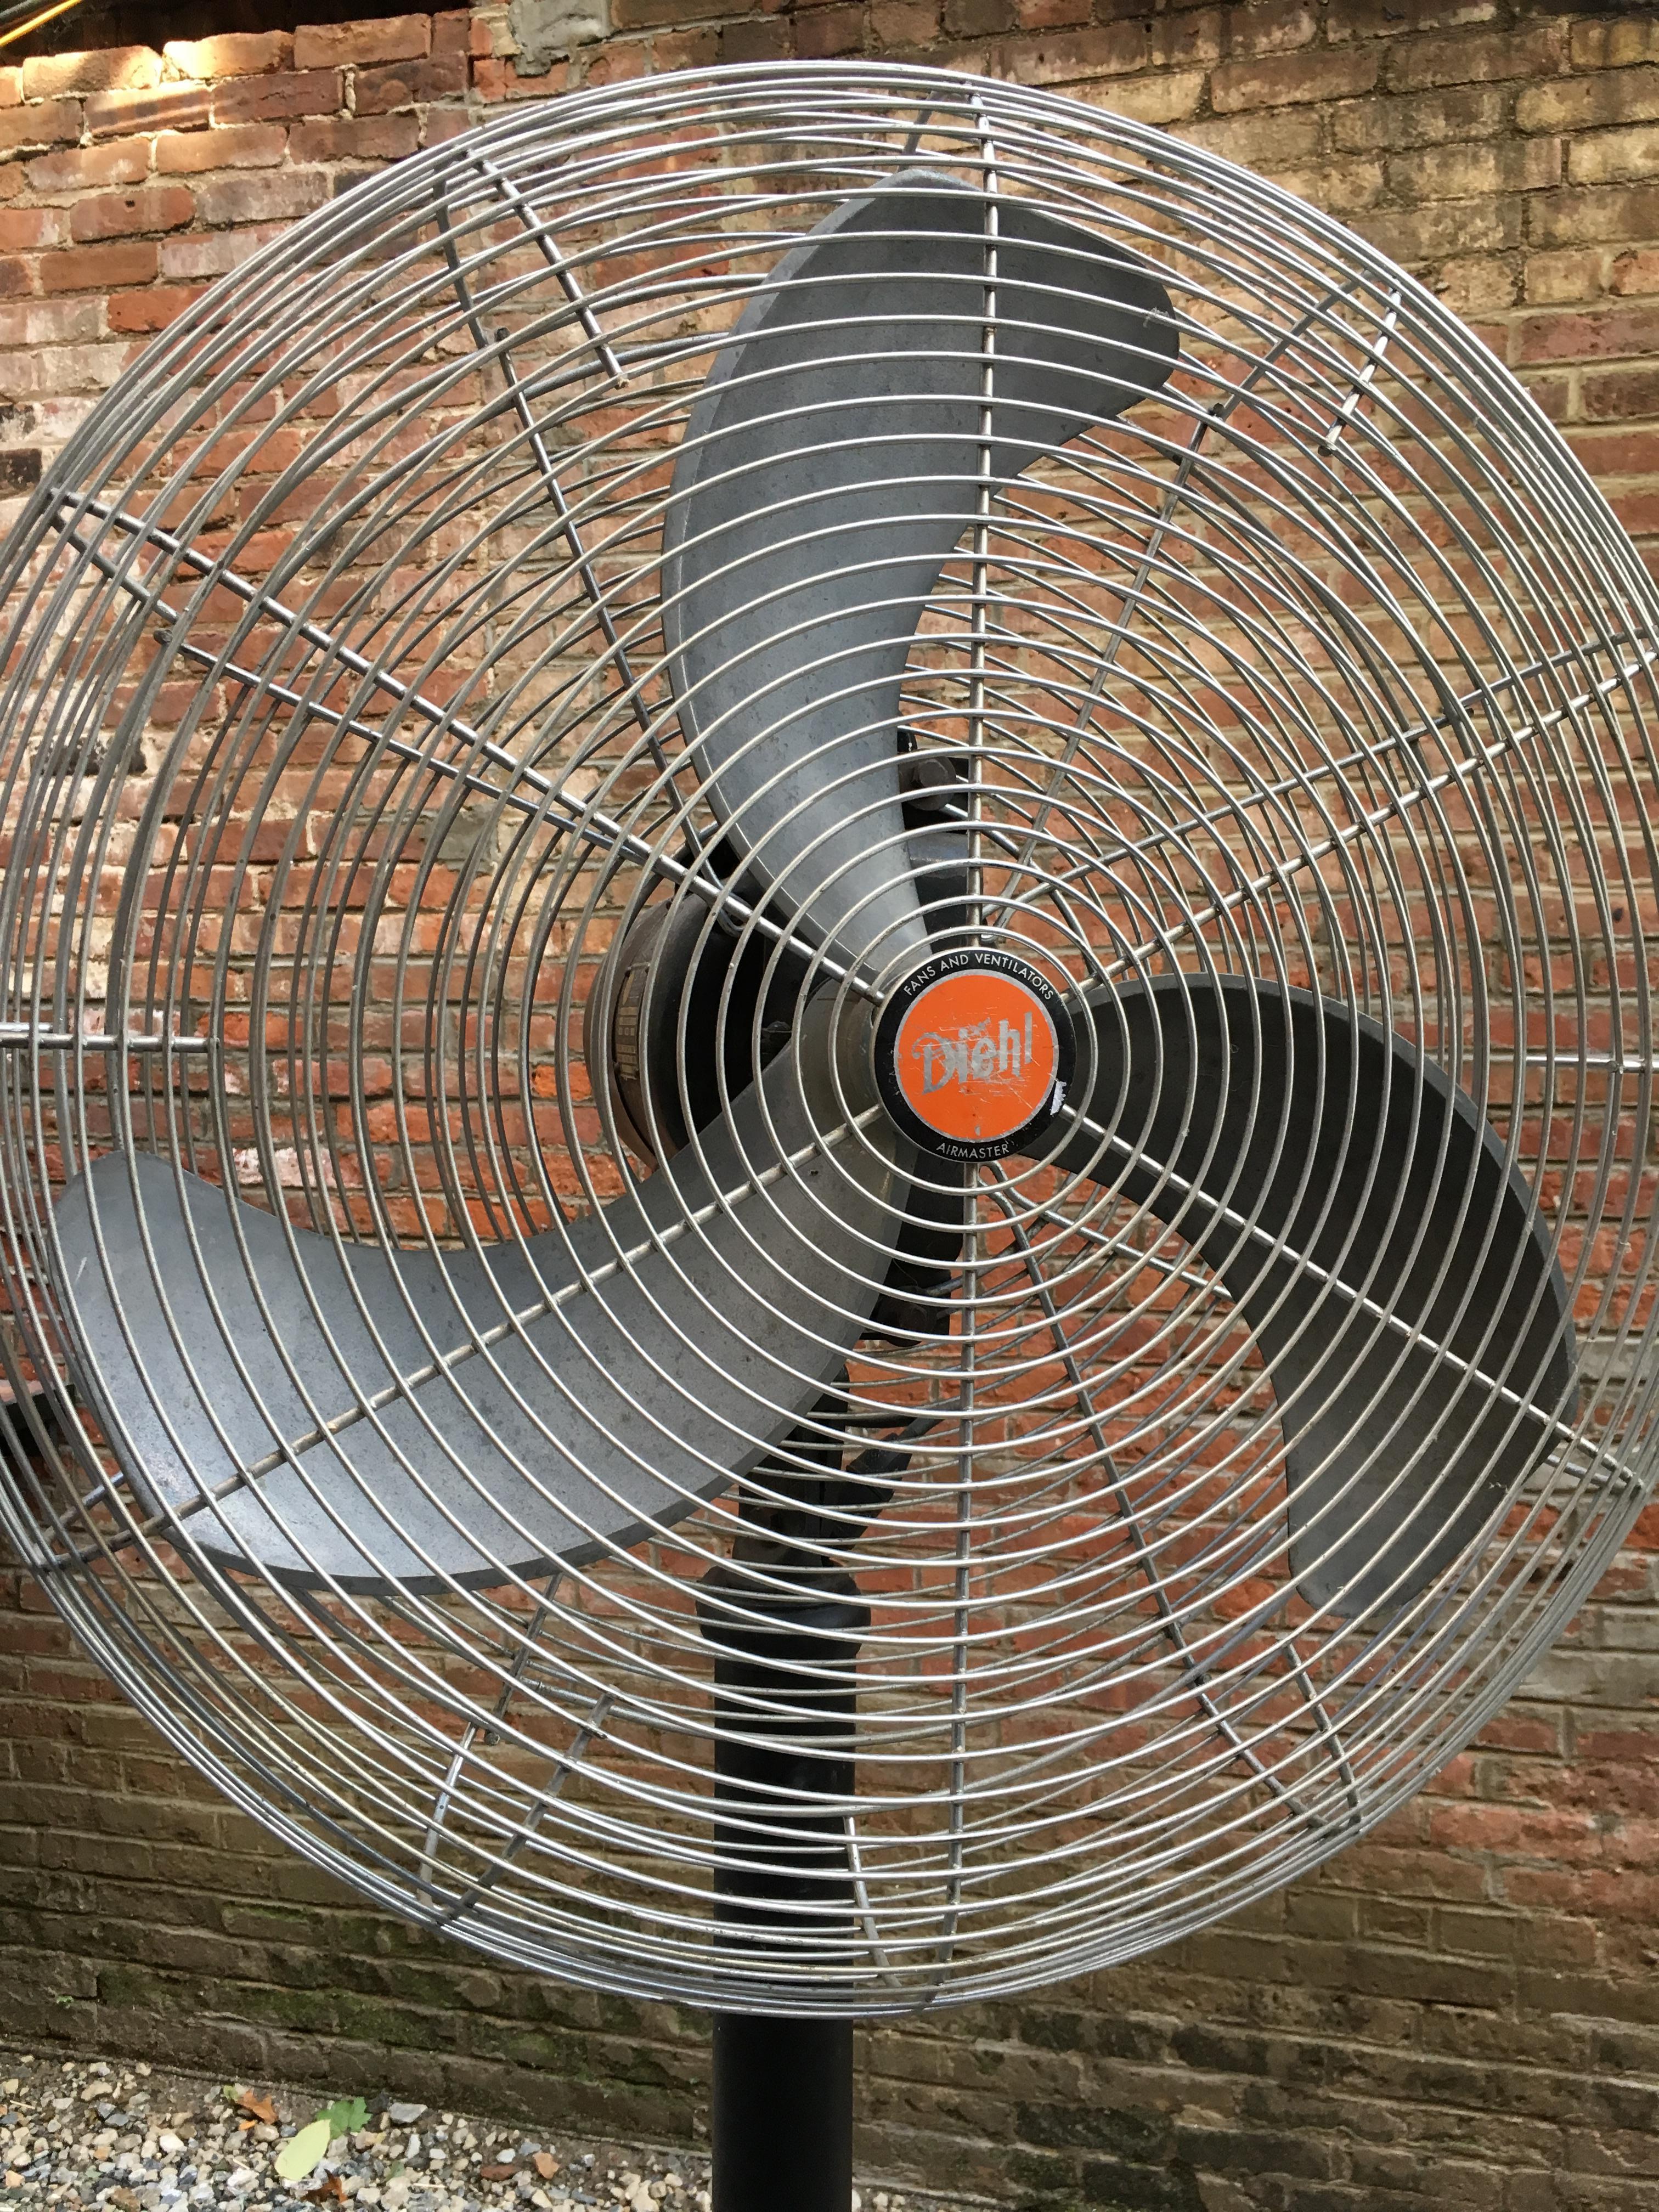 Diehl Industrial Airmaster Oscillating Floor Fan